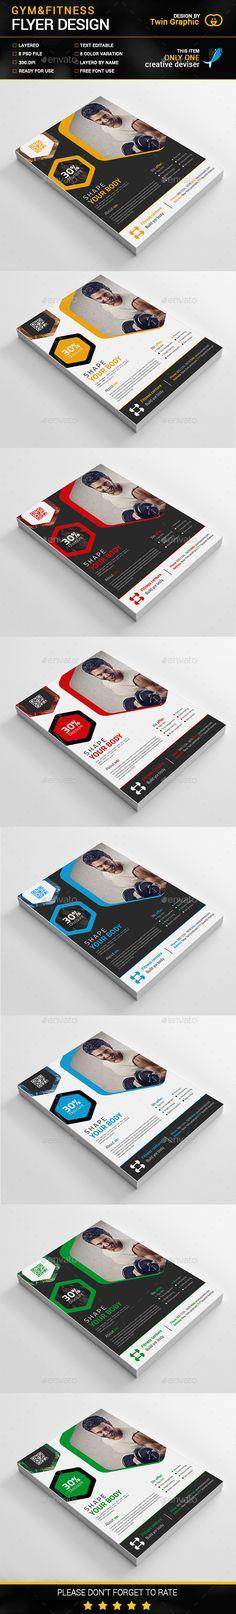 #Gym&Fitness #Flyer #Design - Sports Events Download here: https://graphicriver.net/item/gymfitness-flyer-design/15432995?ref=alena994